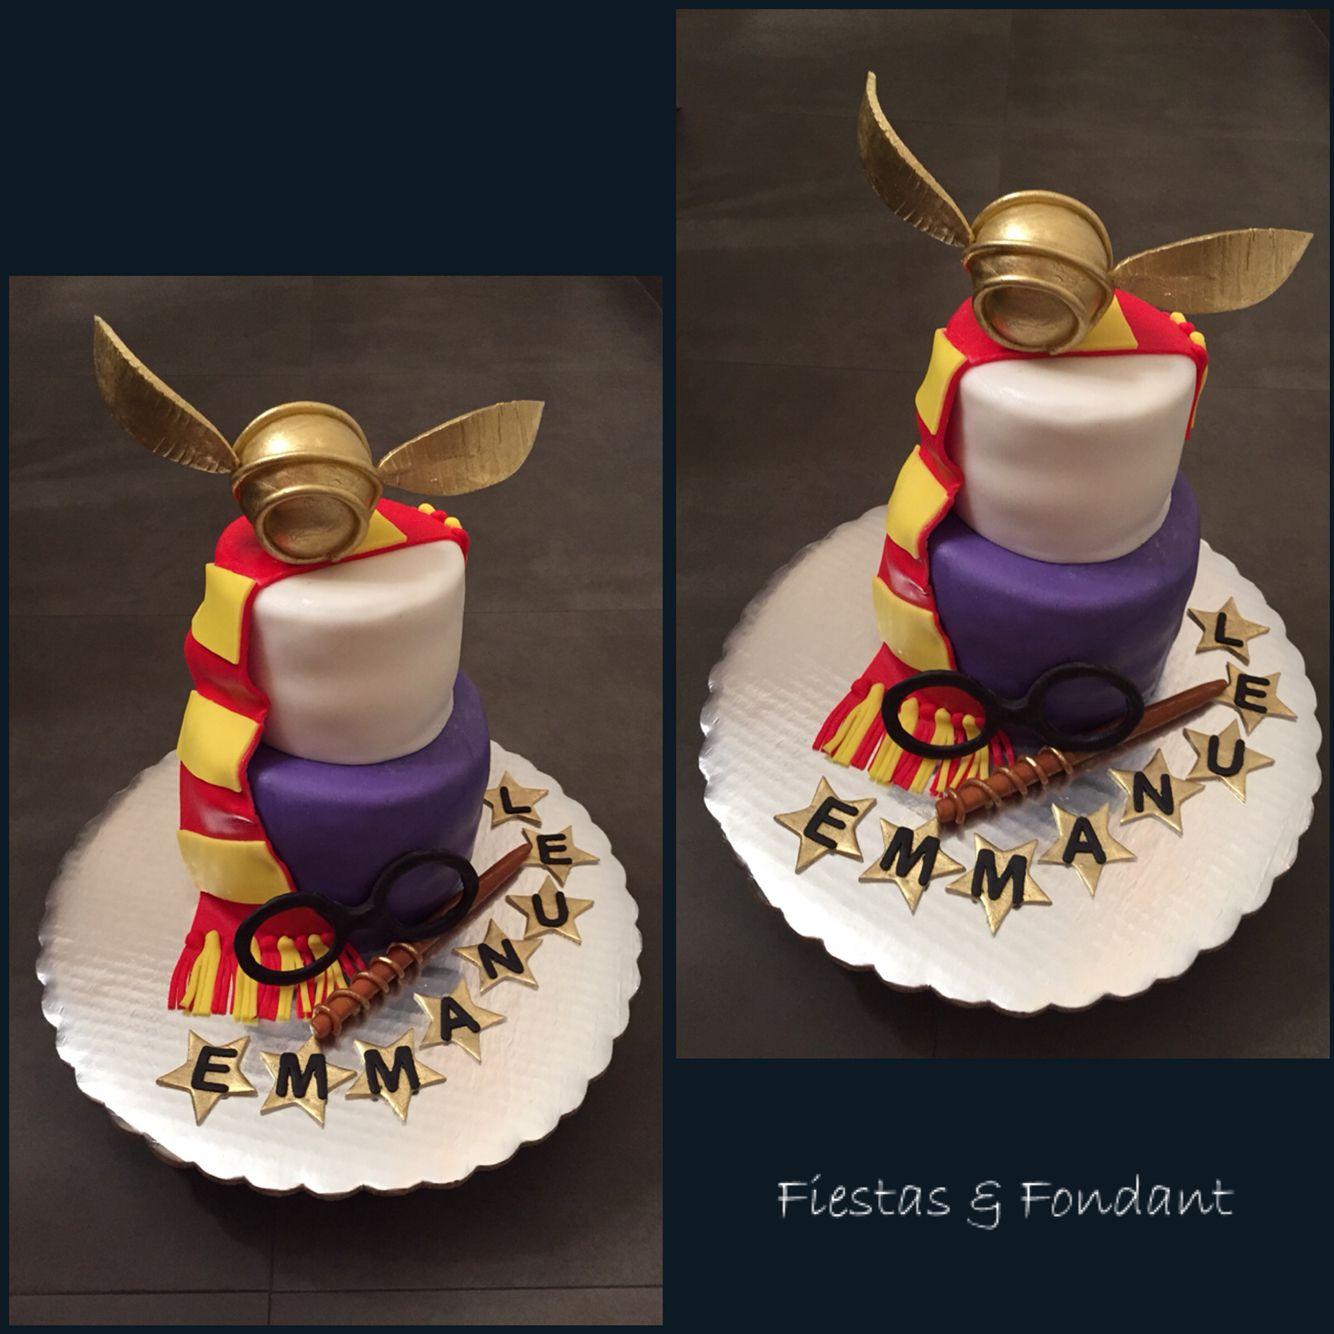 Harry Potter cake by Fiestas & Fondant